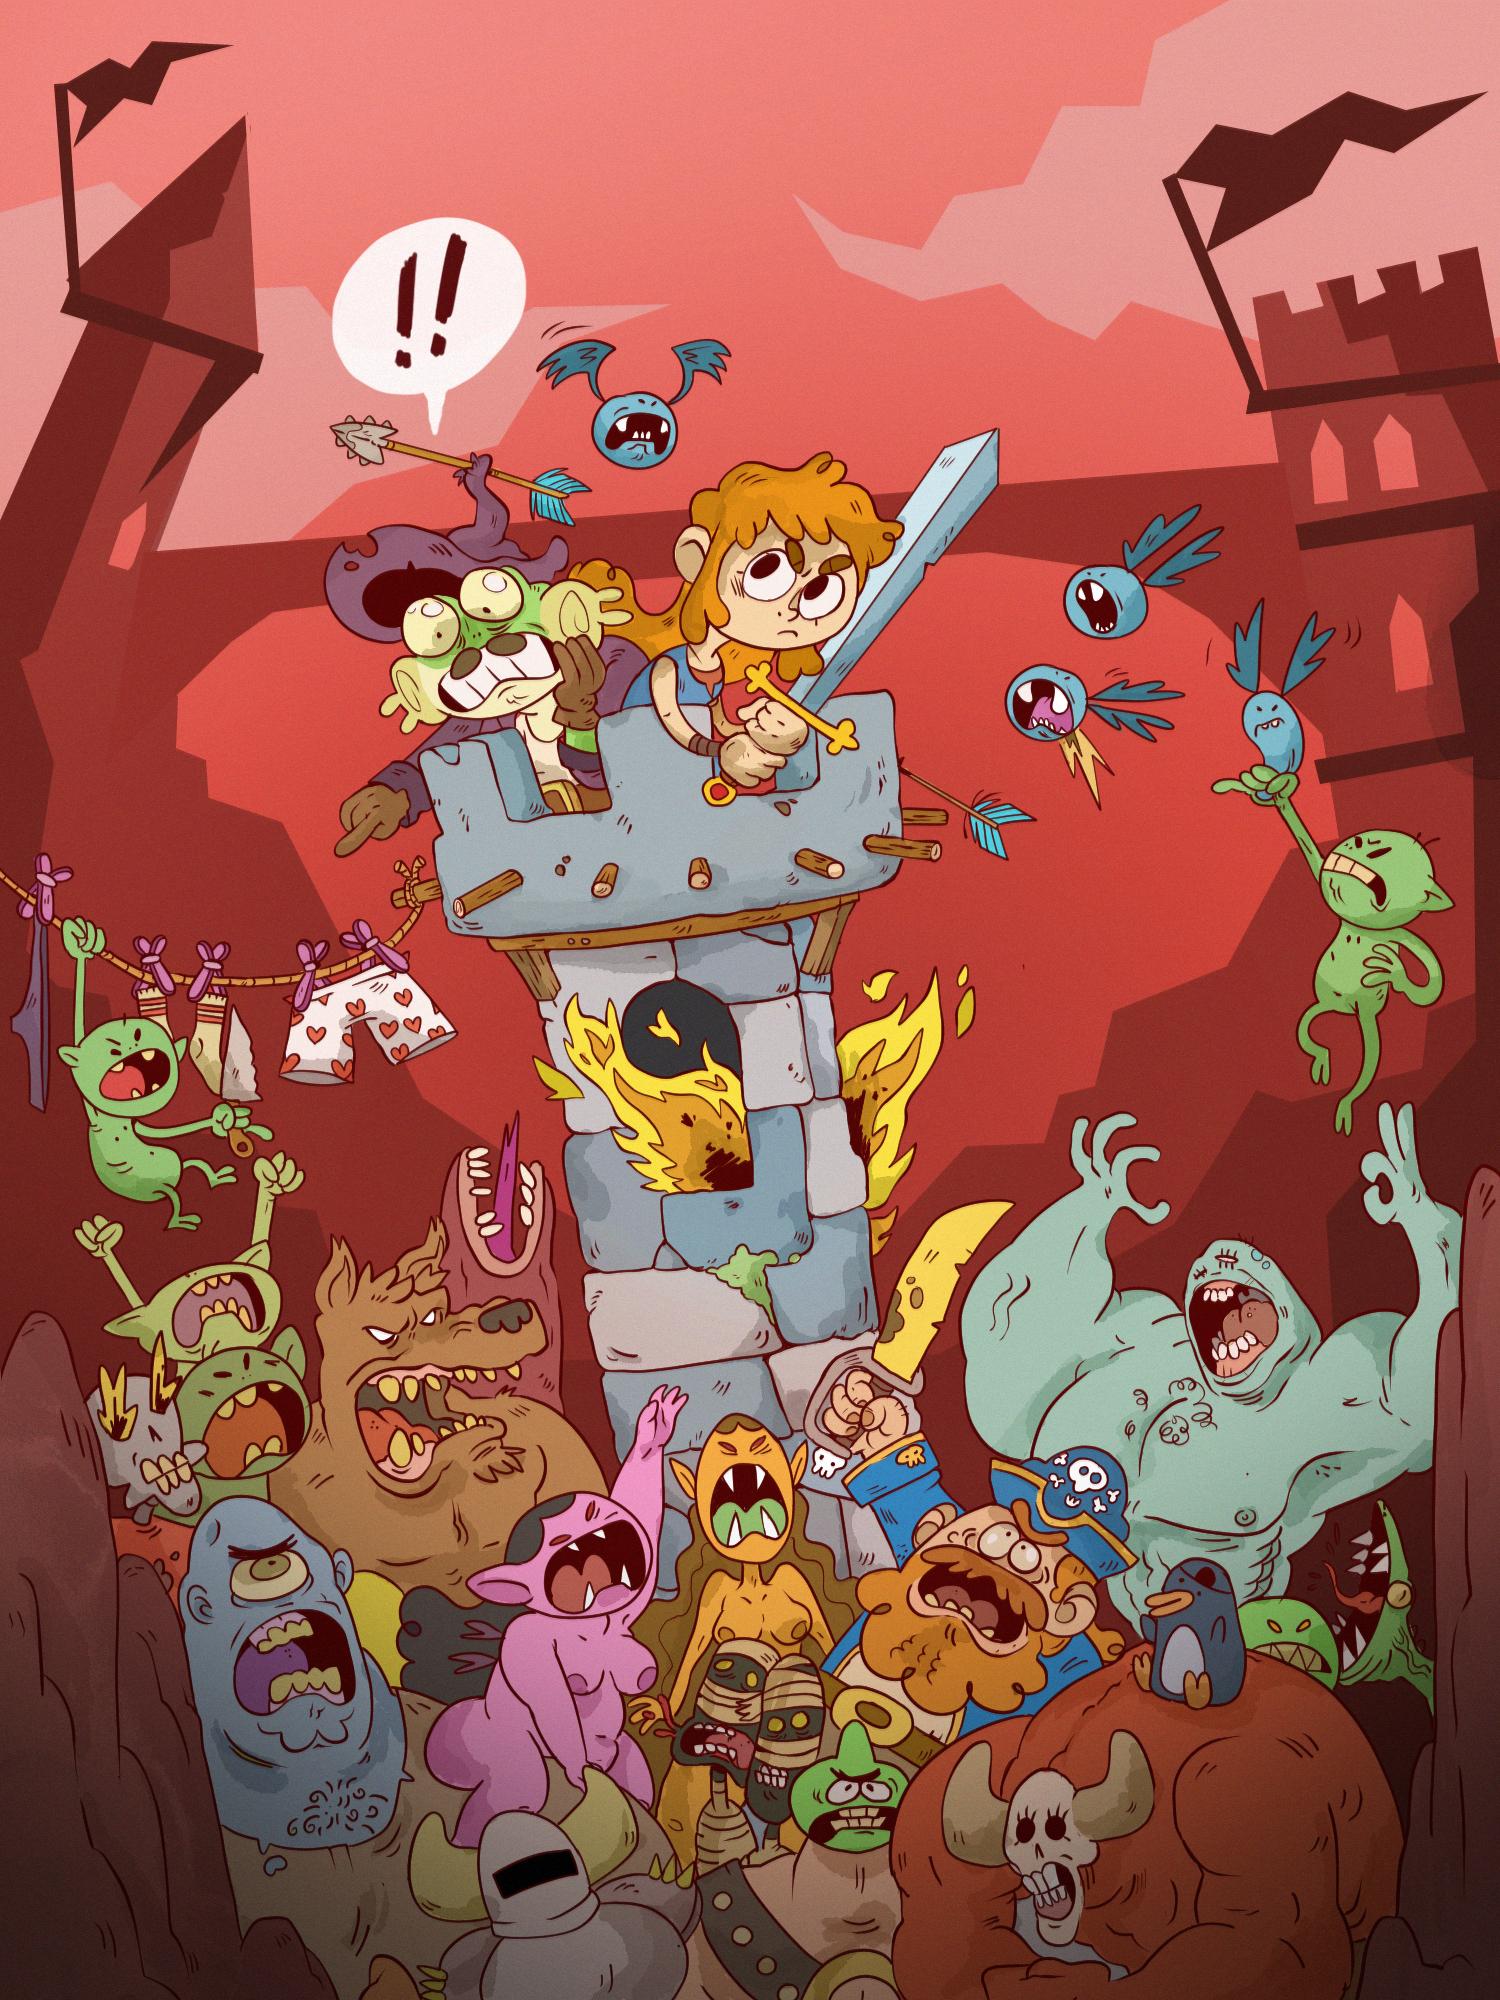 Monsters ambush